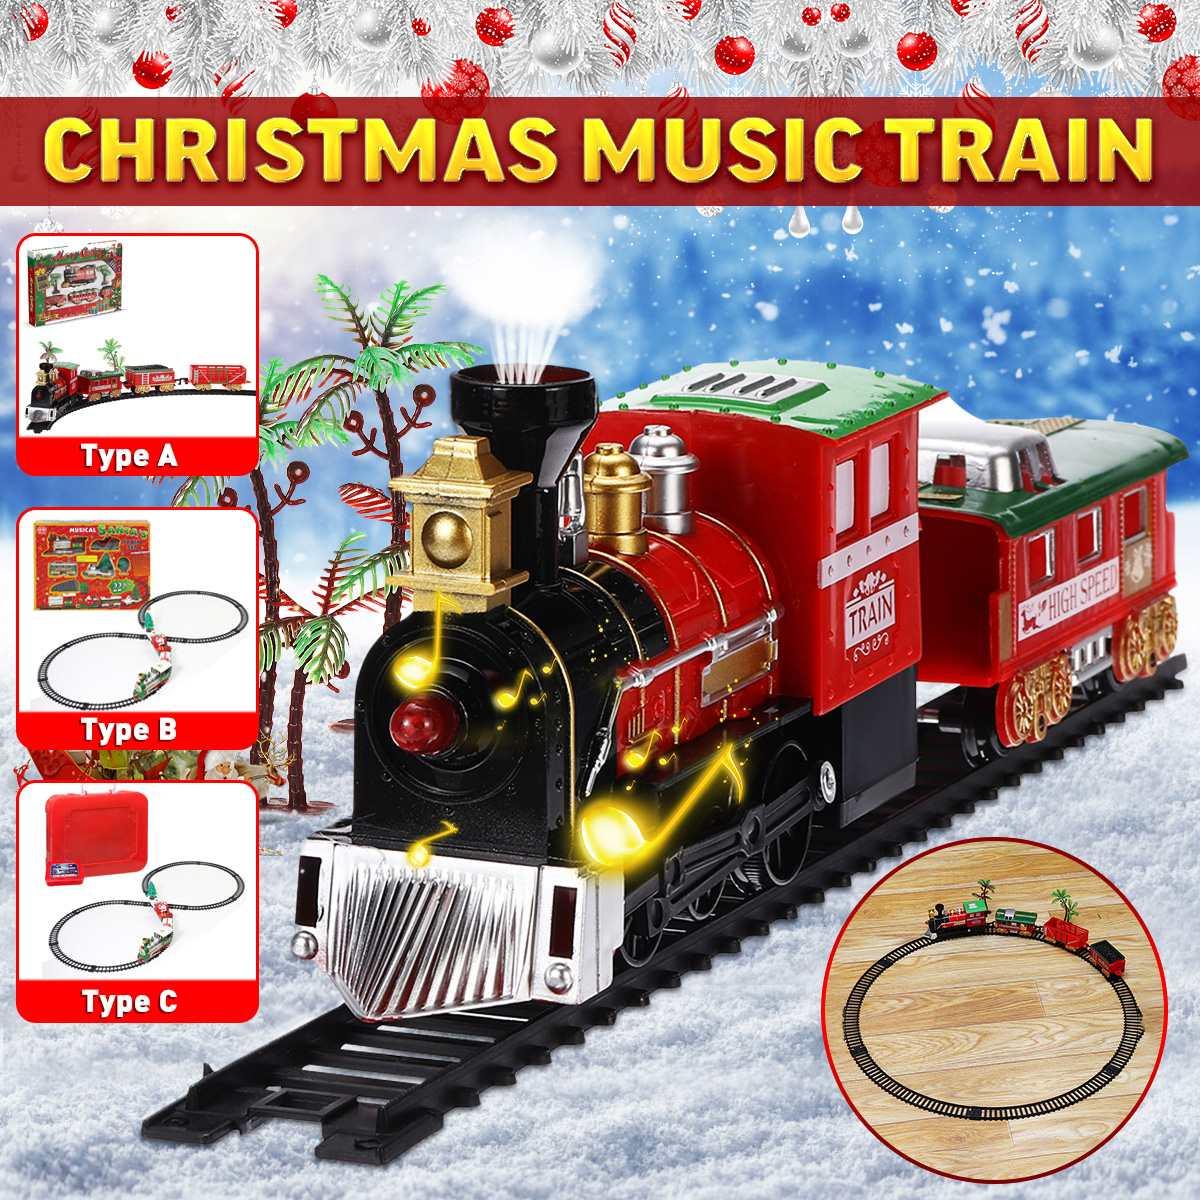 Christmas Train Set Railway Rail Tracks Toys Electric Railway Train Set with Locomotive Engine Cars Lights And Sounds Xmas Gift